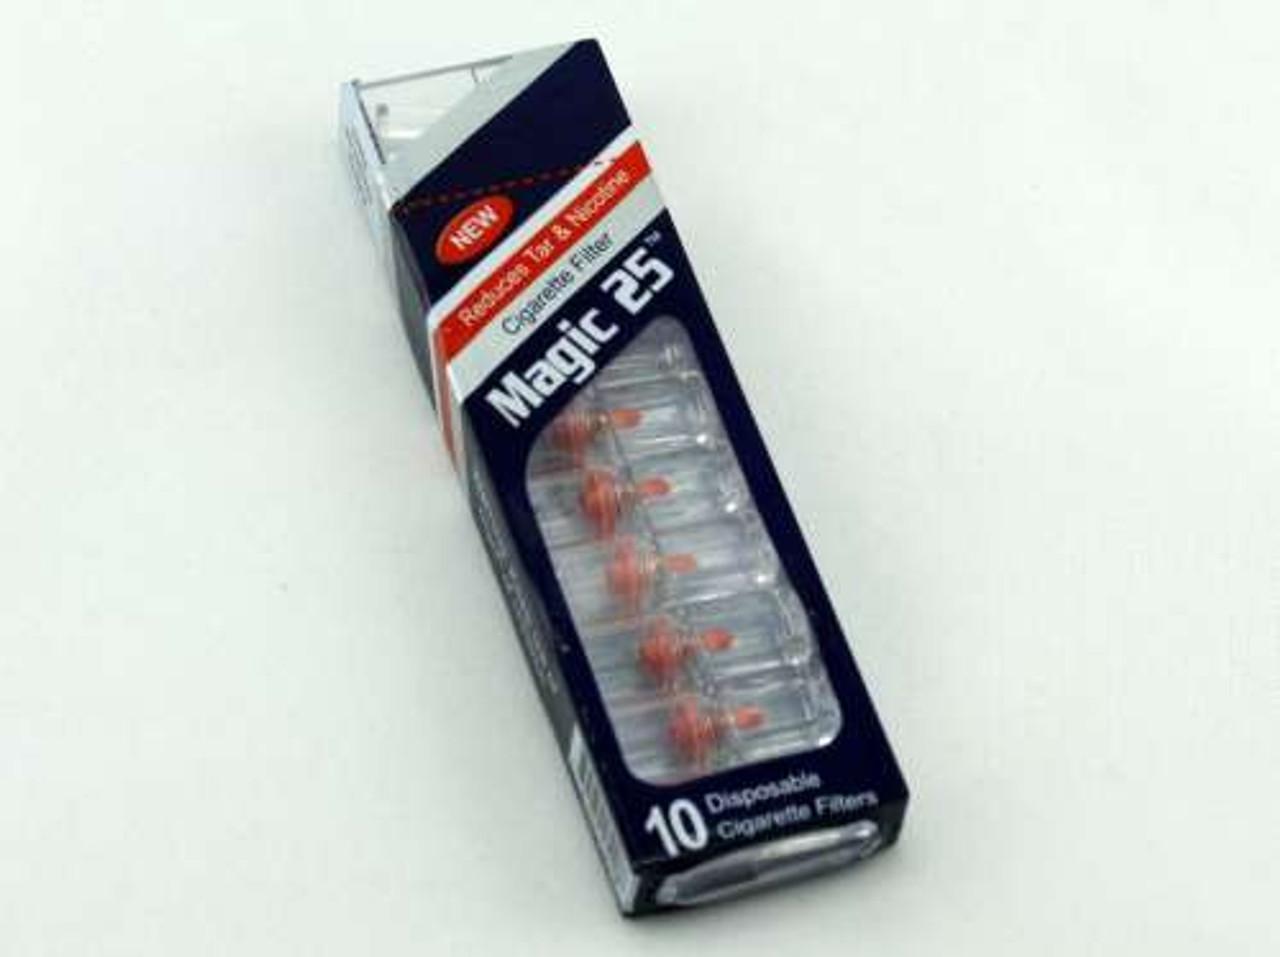 Magic 25 Disposable Cigarette Filters